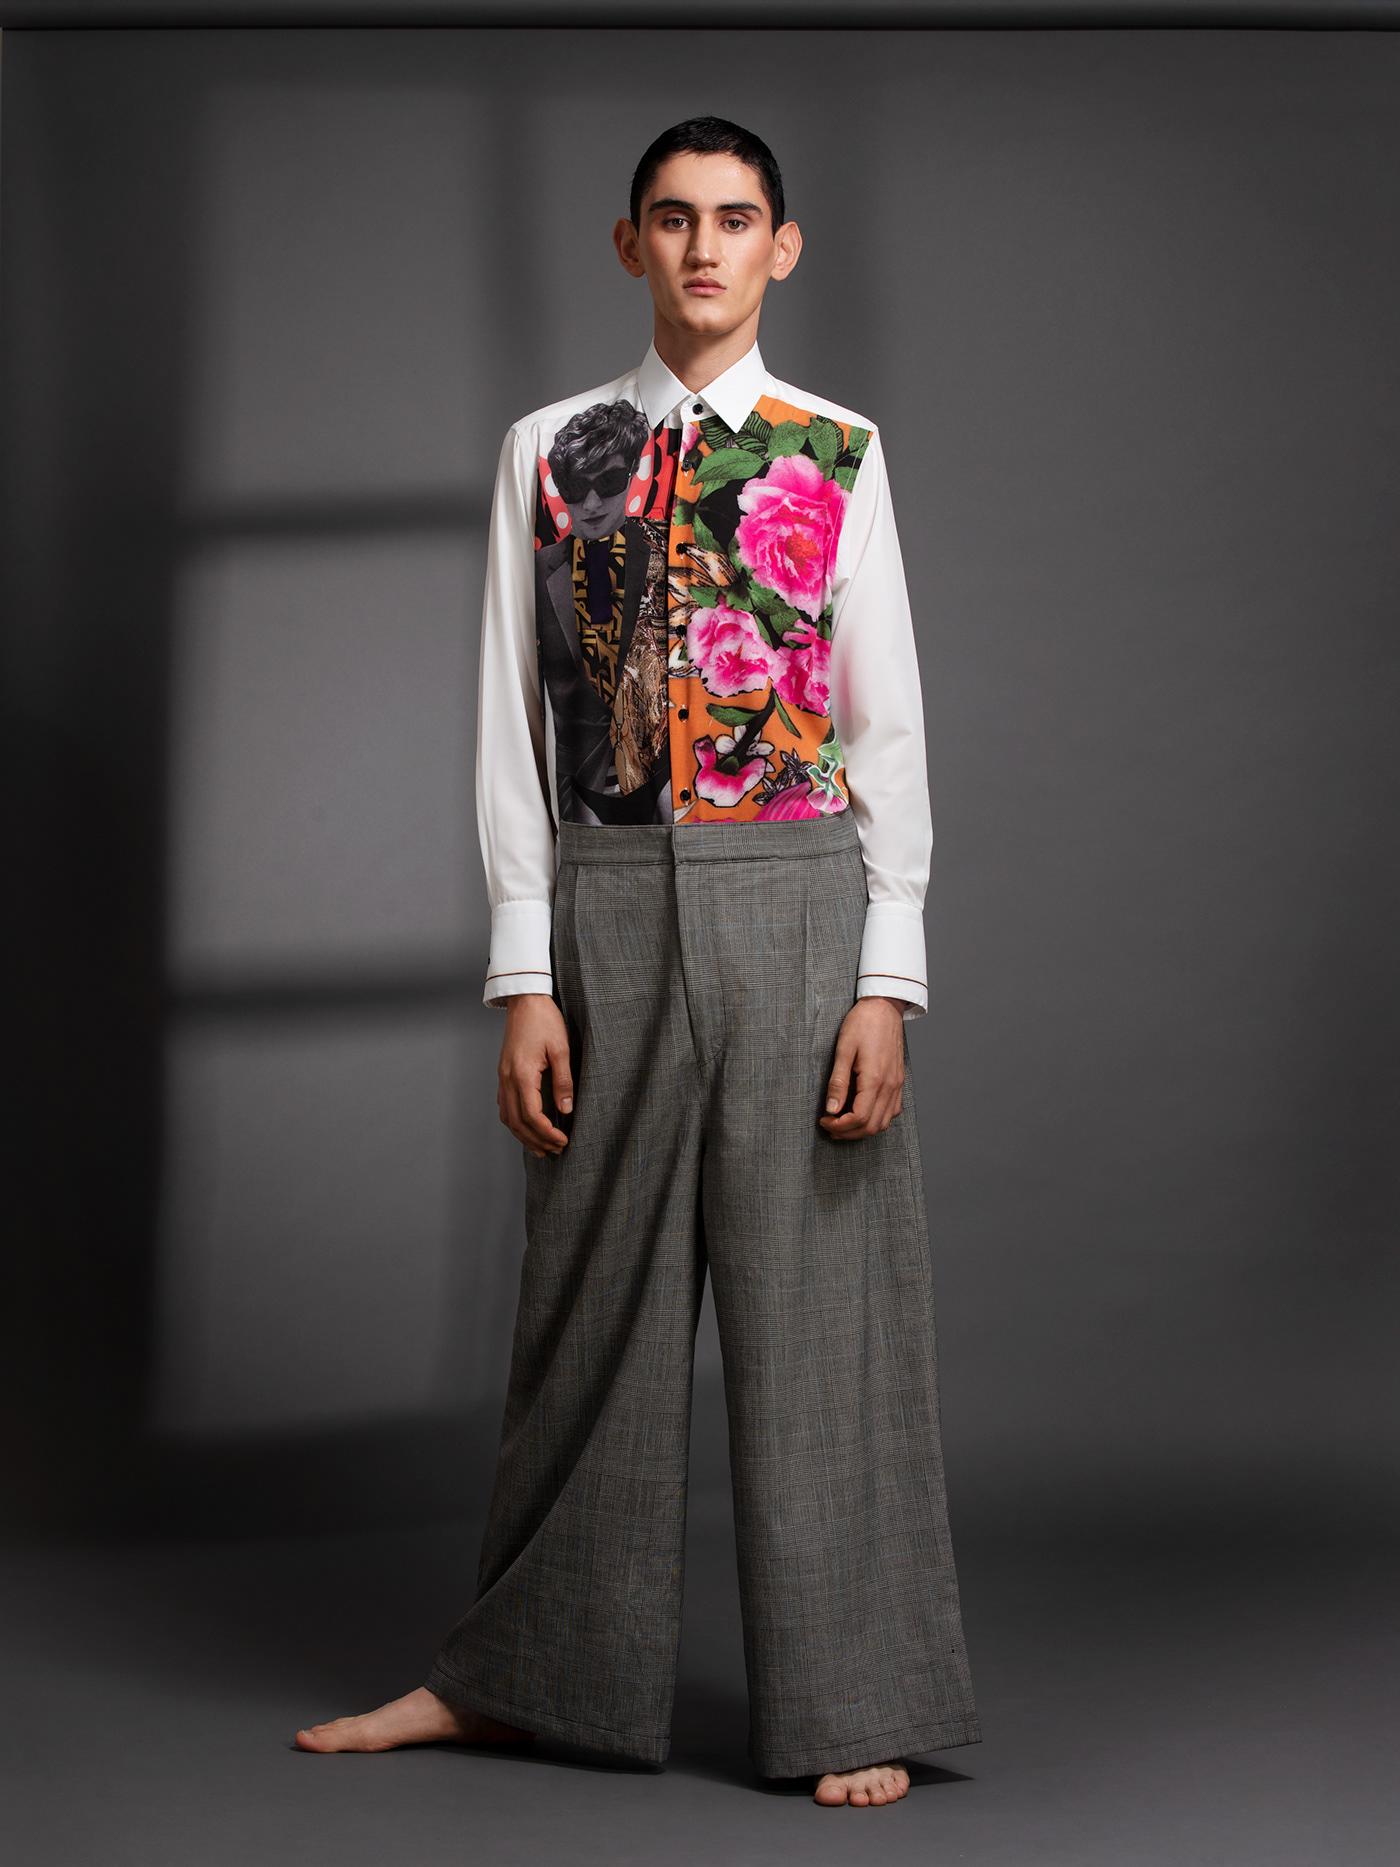 bogota camilo marquez campaing color editorial eriko Fashion  Photography  prints week